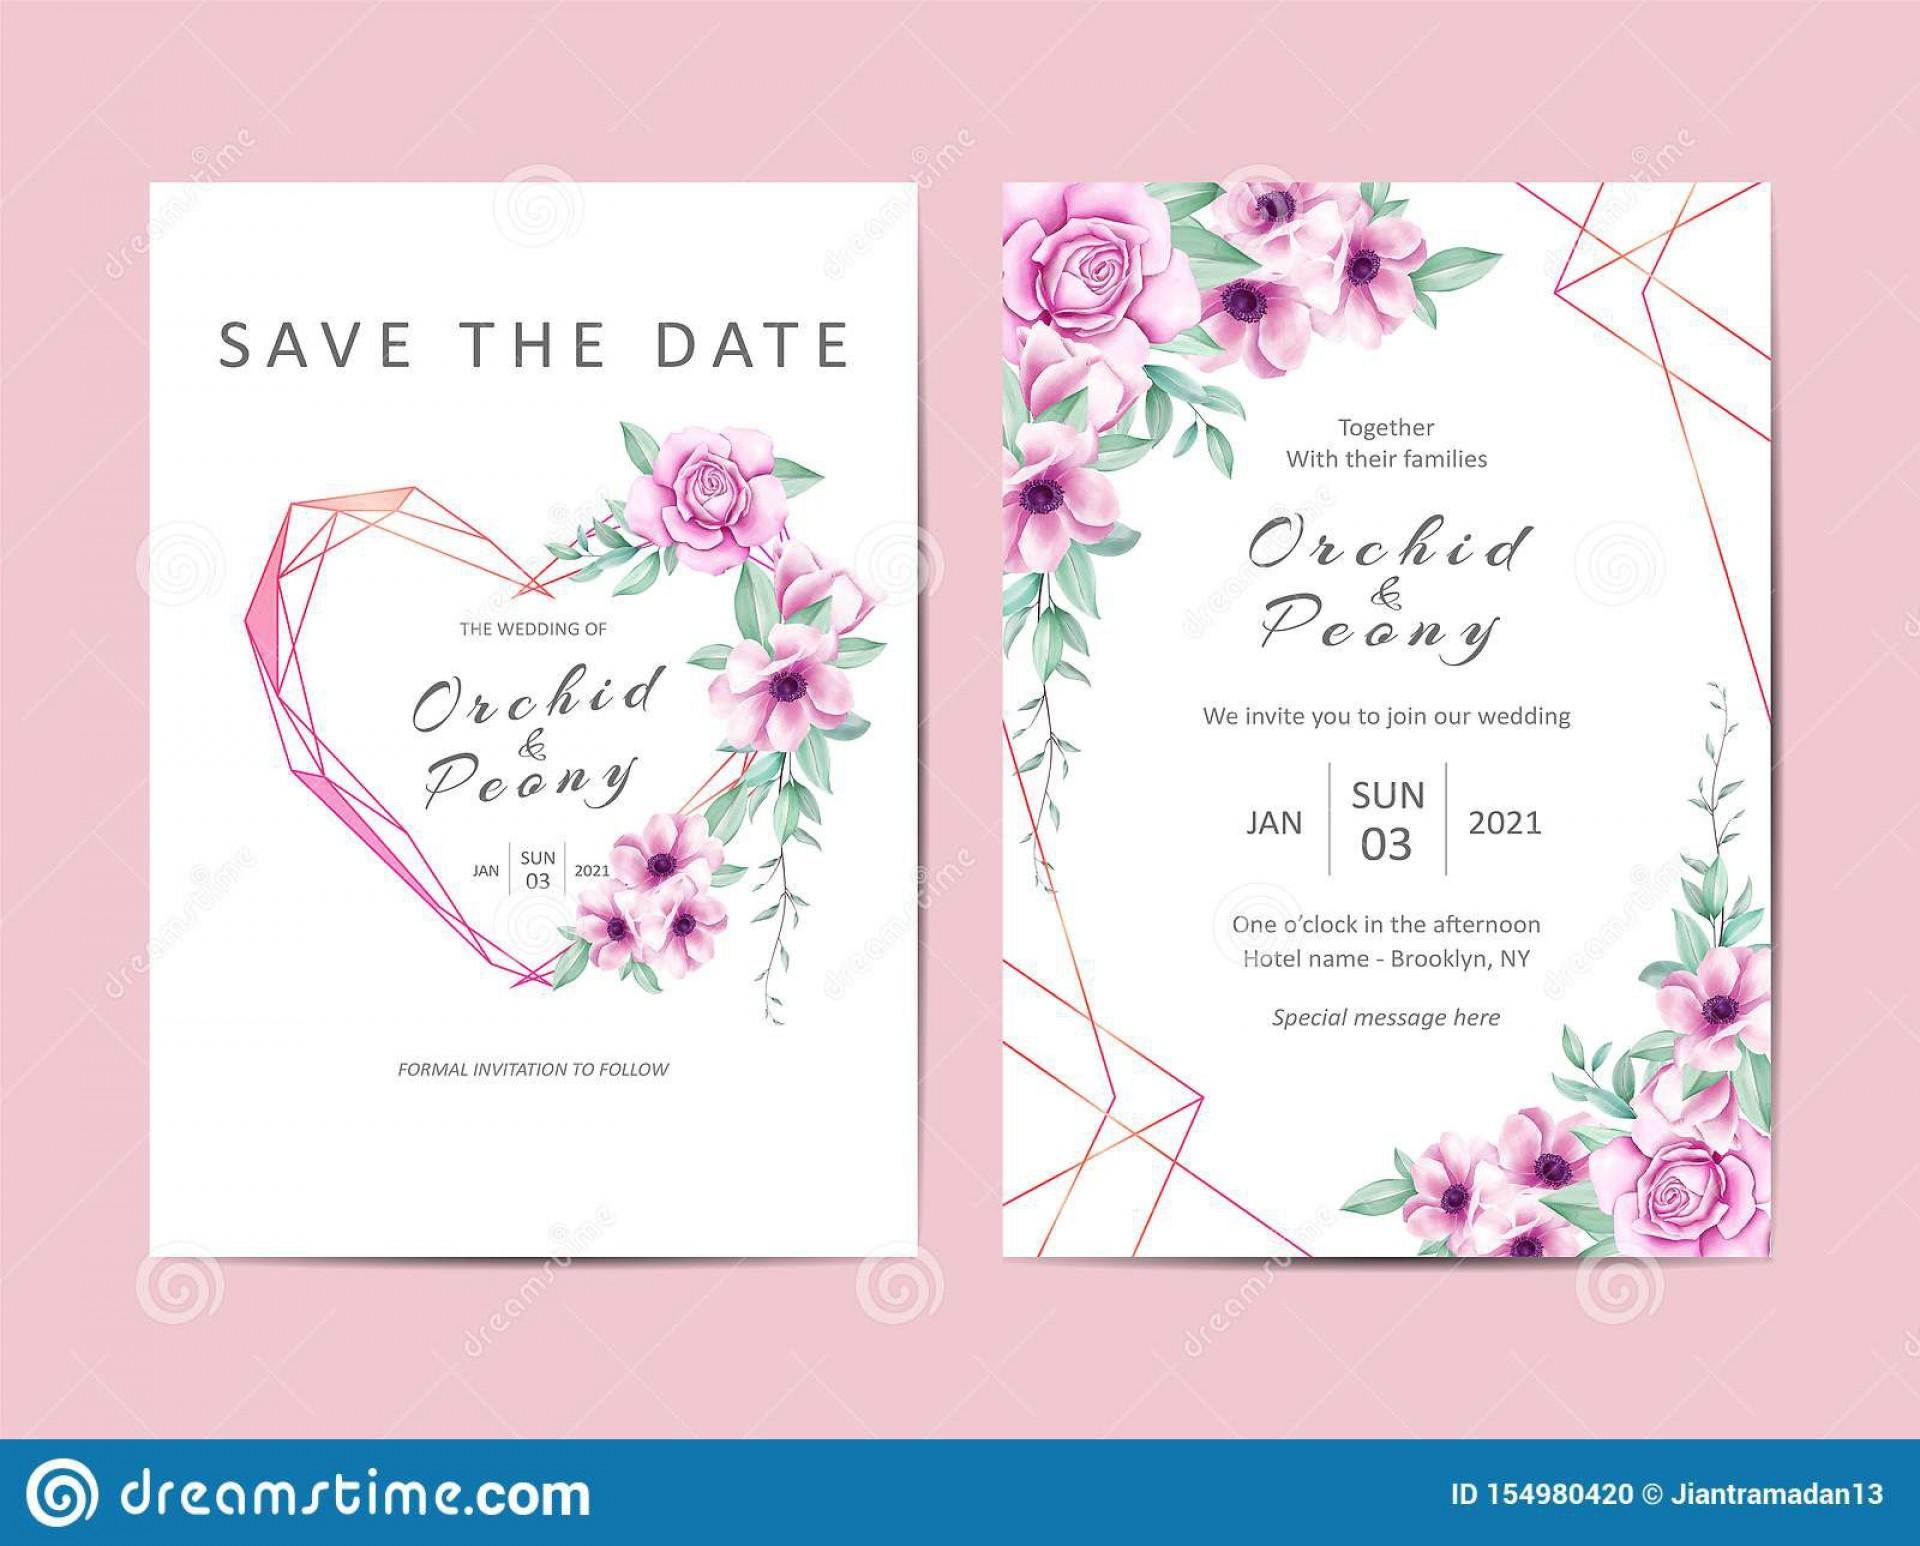 003 Singular Editable Wedding Invitation Template Photo  Templates Tamil Card Free Download Psd Online1920